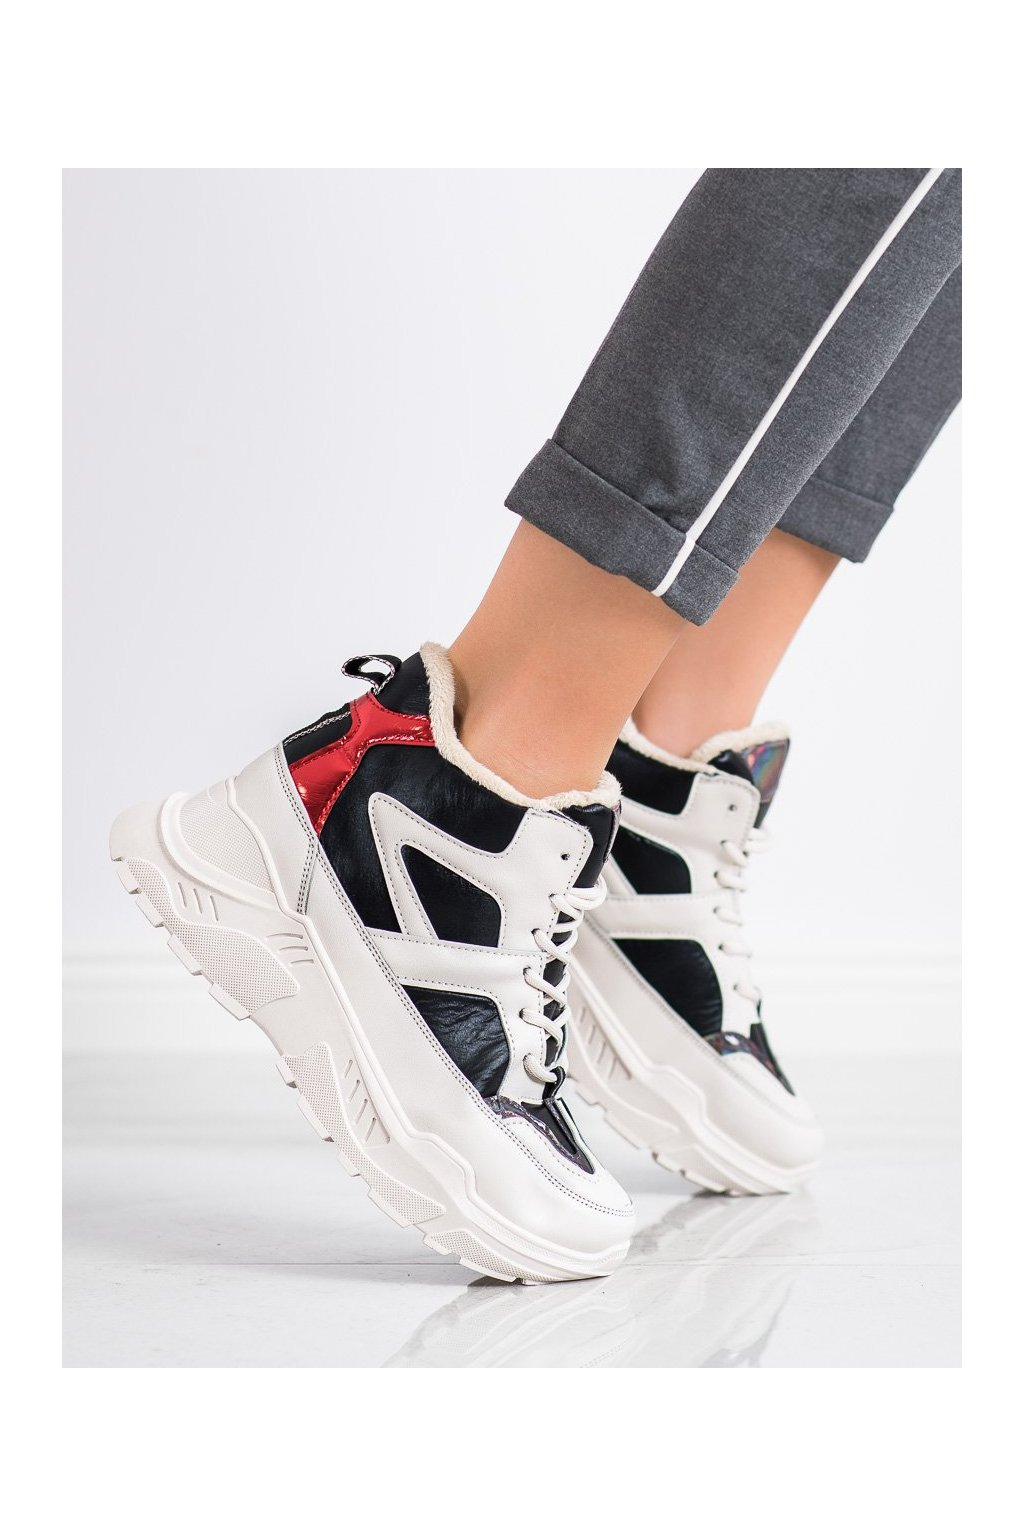 Biele dámske topánky Seastar kod LV95B